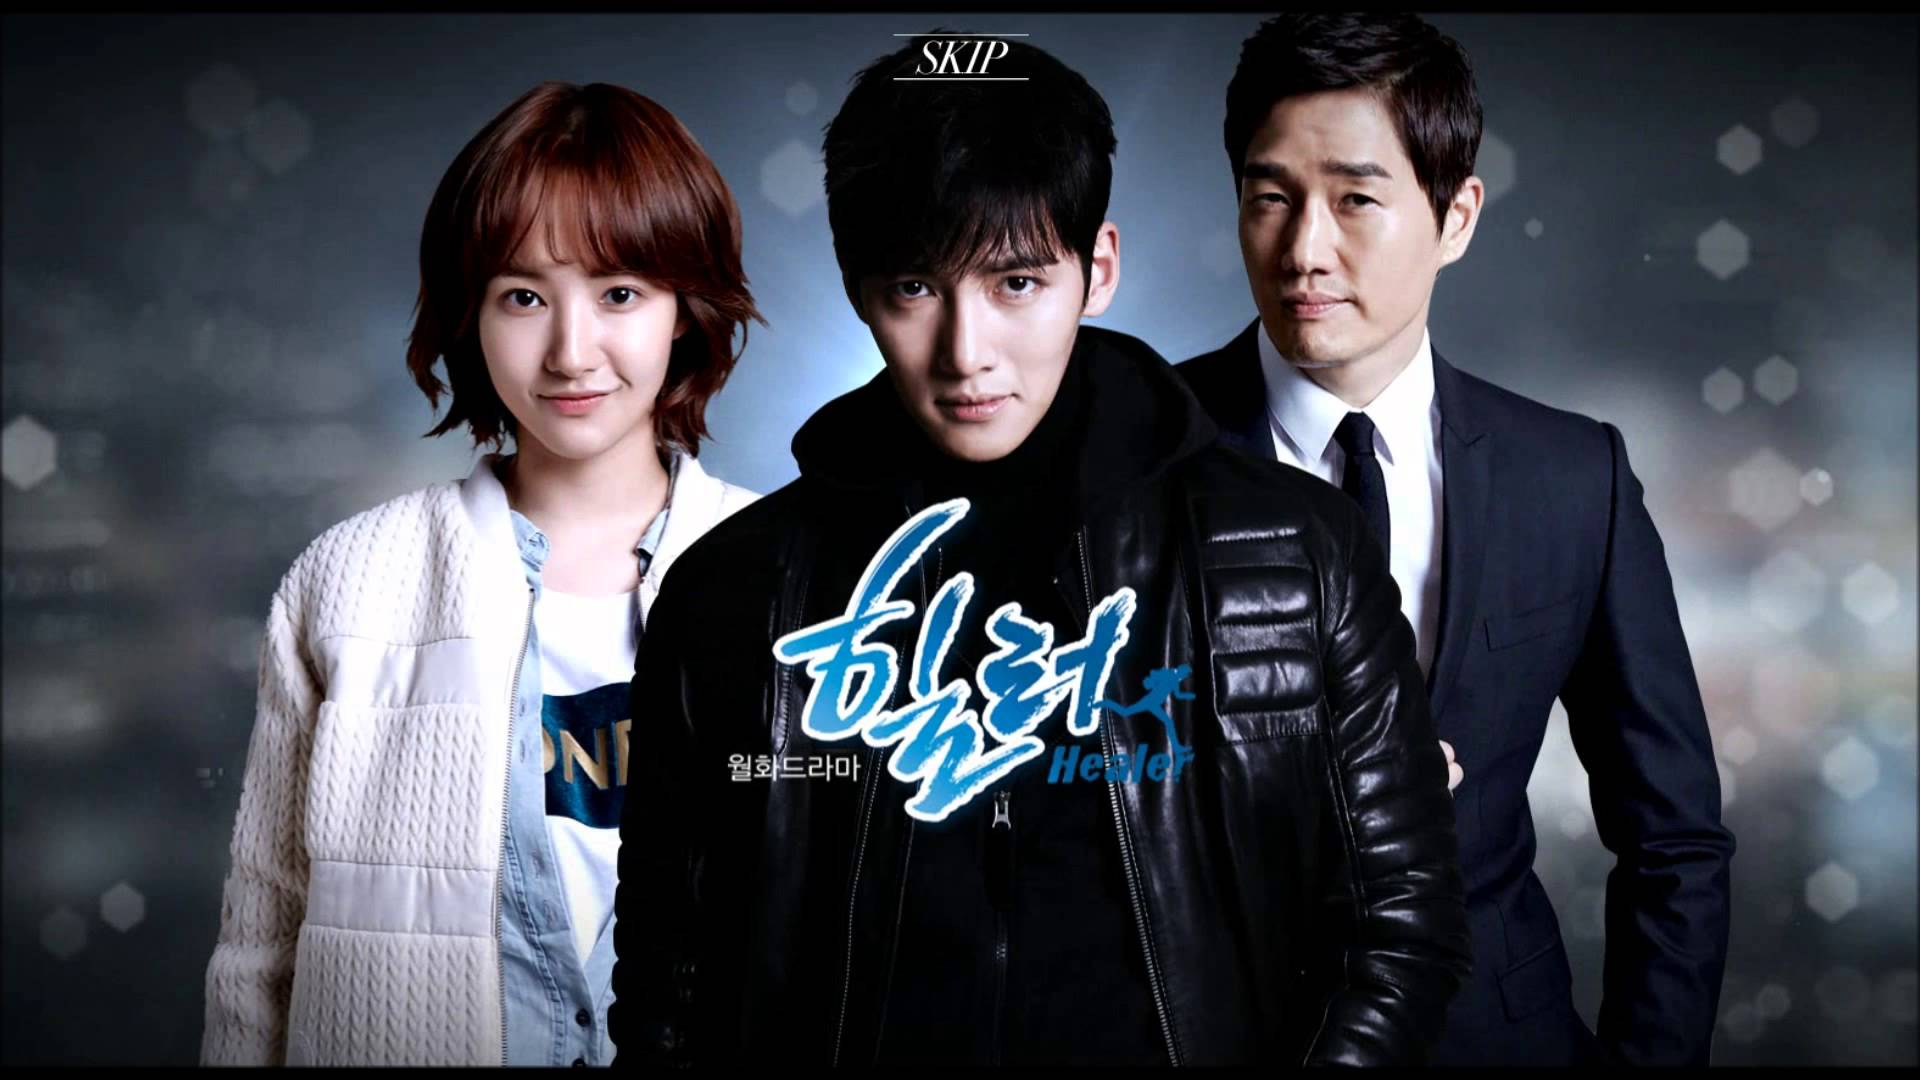 Korean Dramas images Healer drama wallpaper photos 38191164 1920x1080